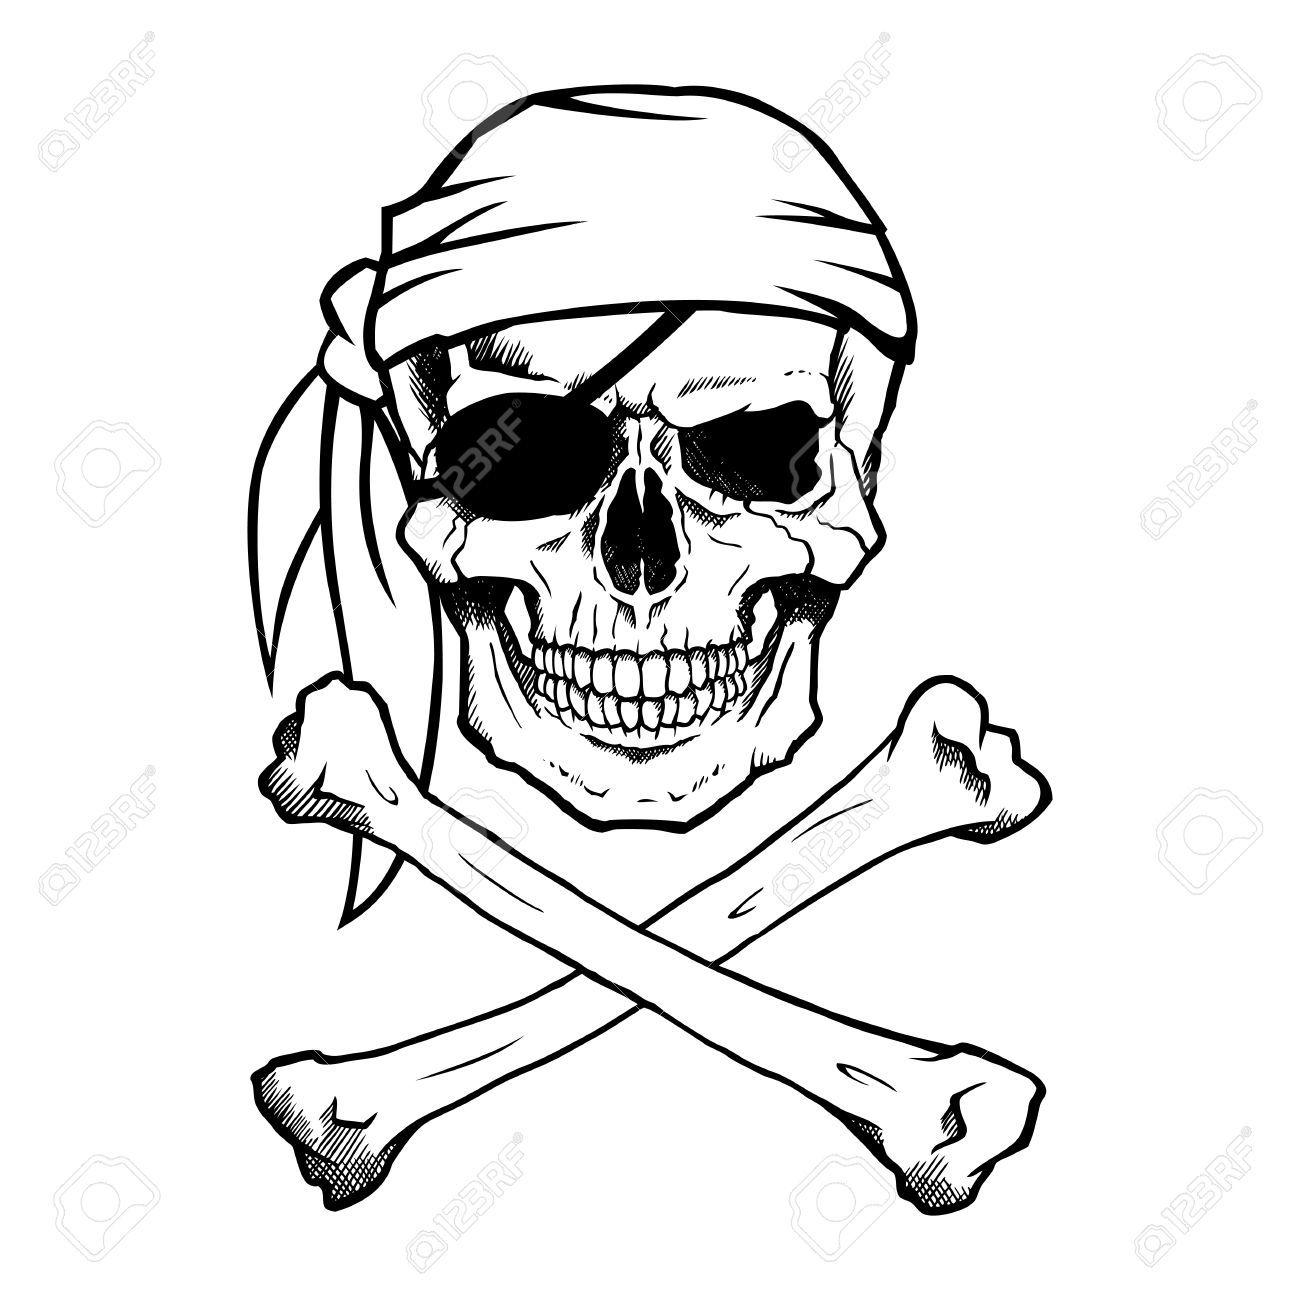 Free Simple Skull Drawing Google Search Tatuaje Pirata Bandera Pirata Calaveras Dibujos